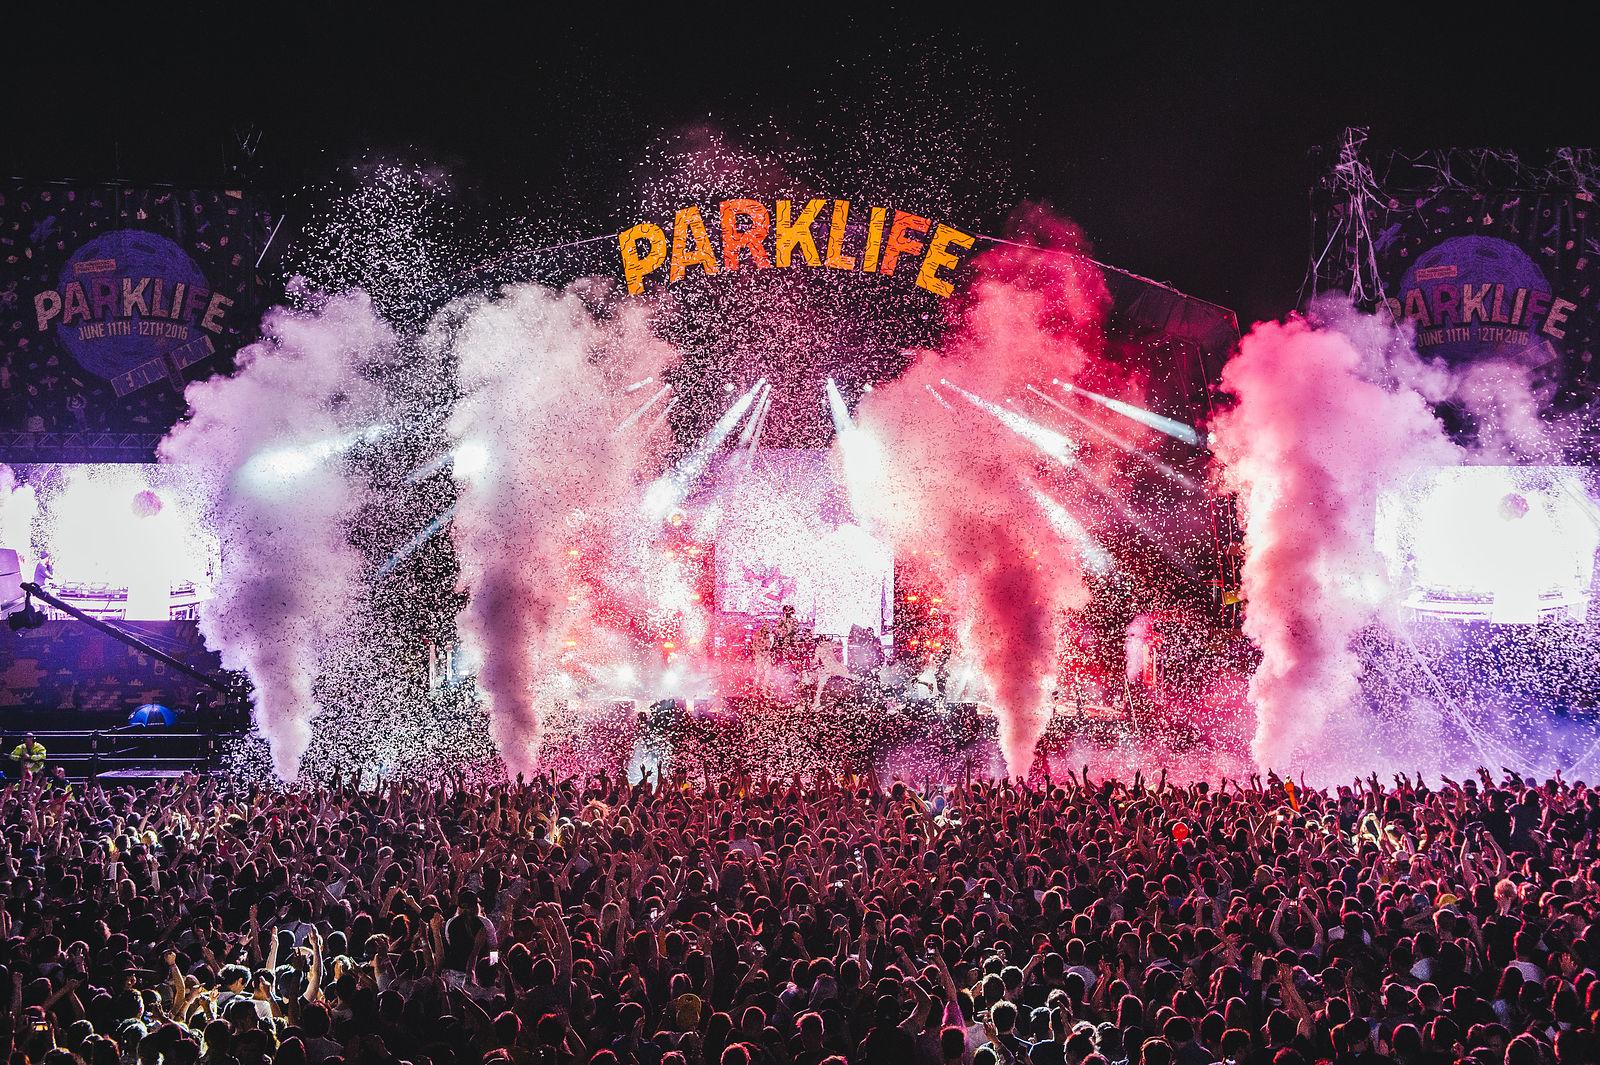 Parklife pic